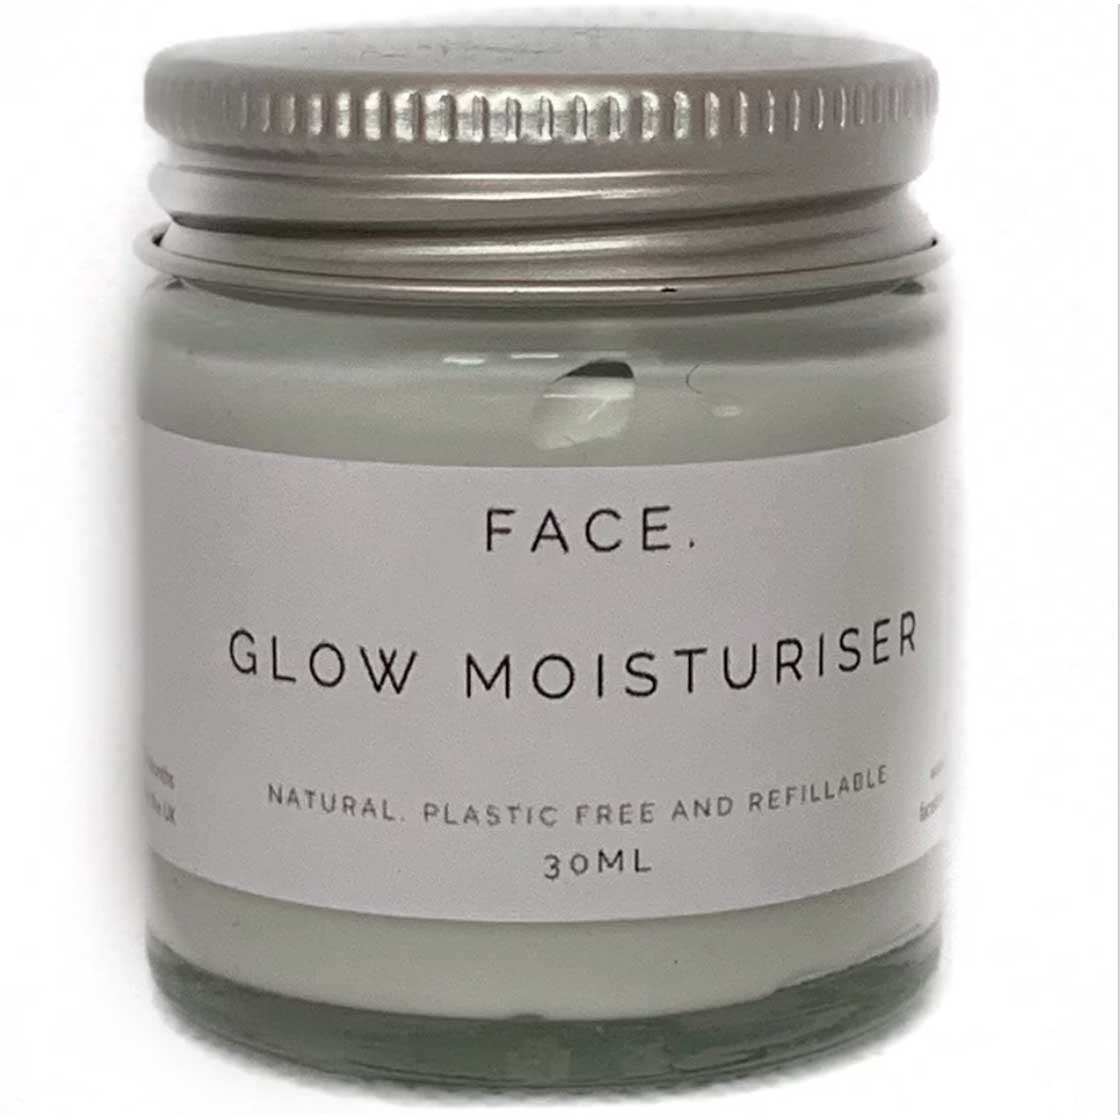 Glow Moisturiser Vit. A, E, C Brightening (30ml) by FACE.